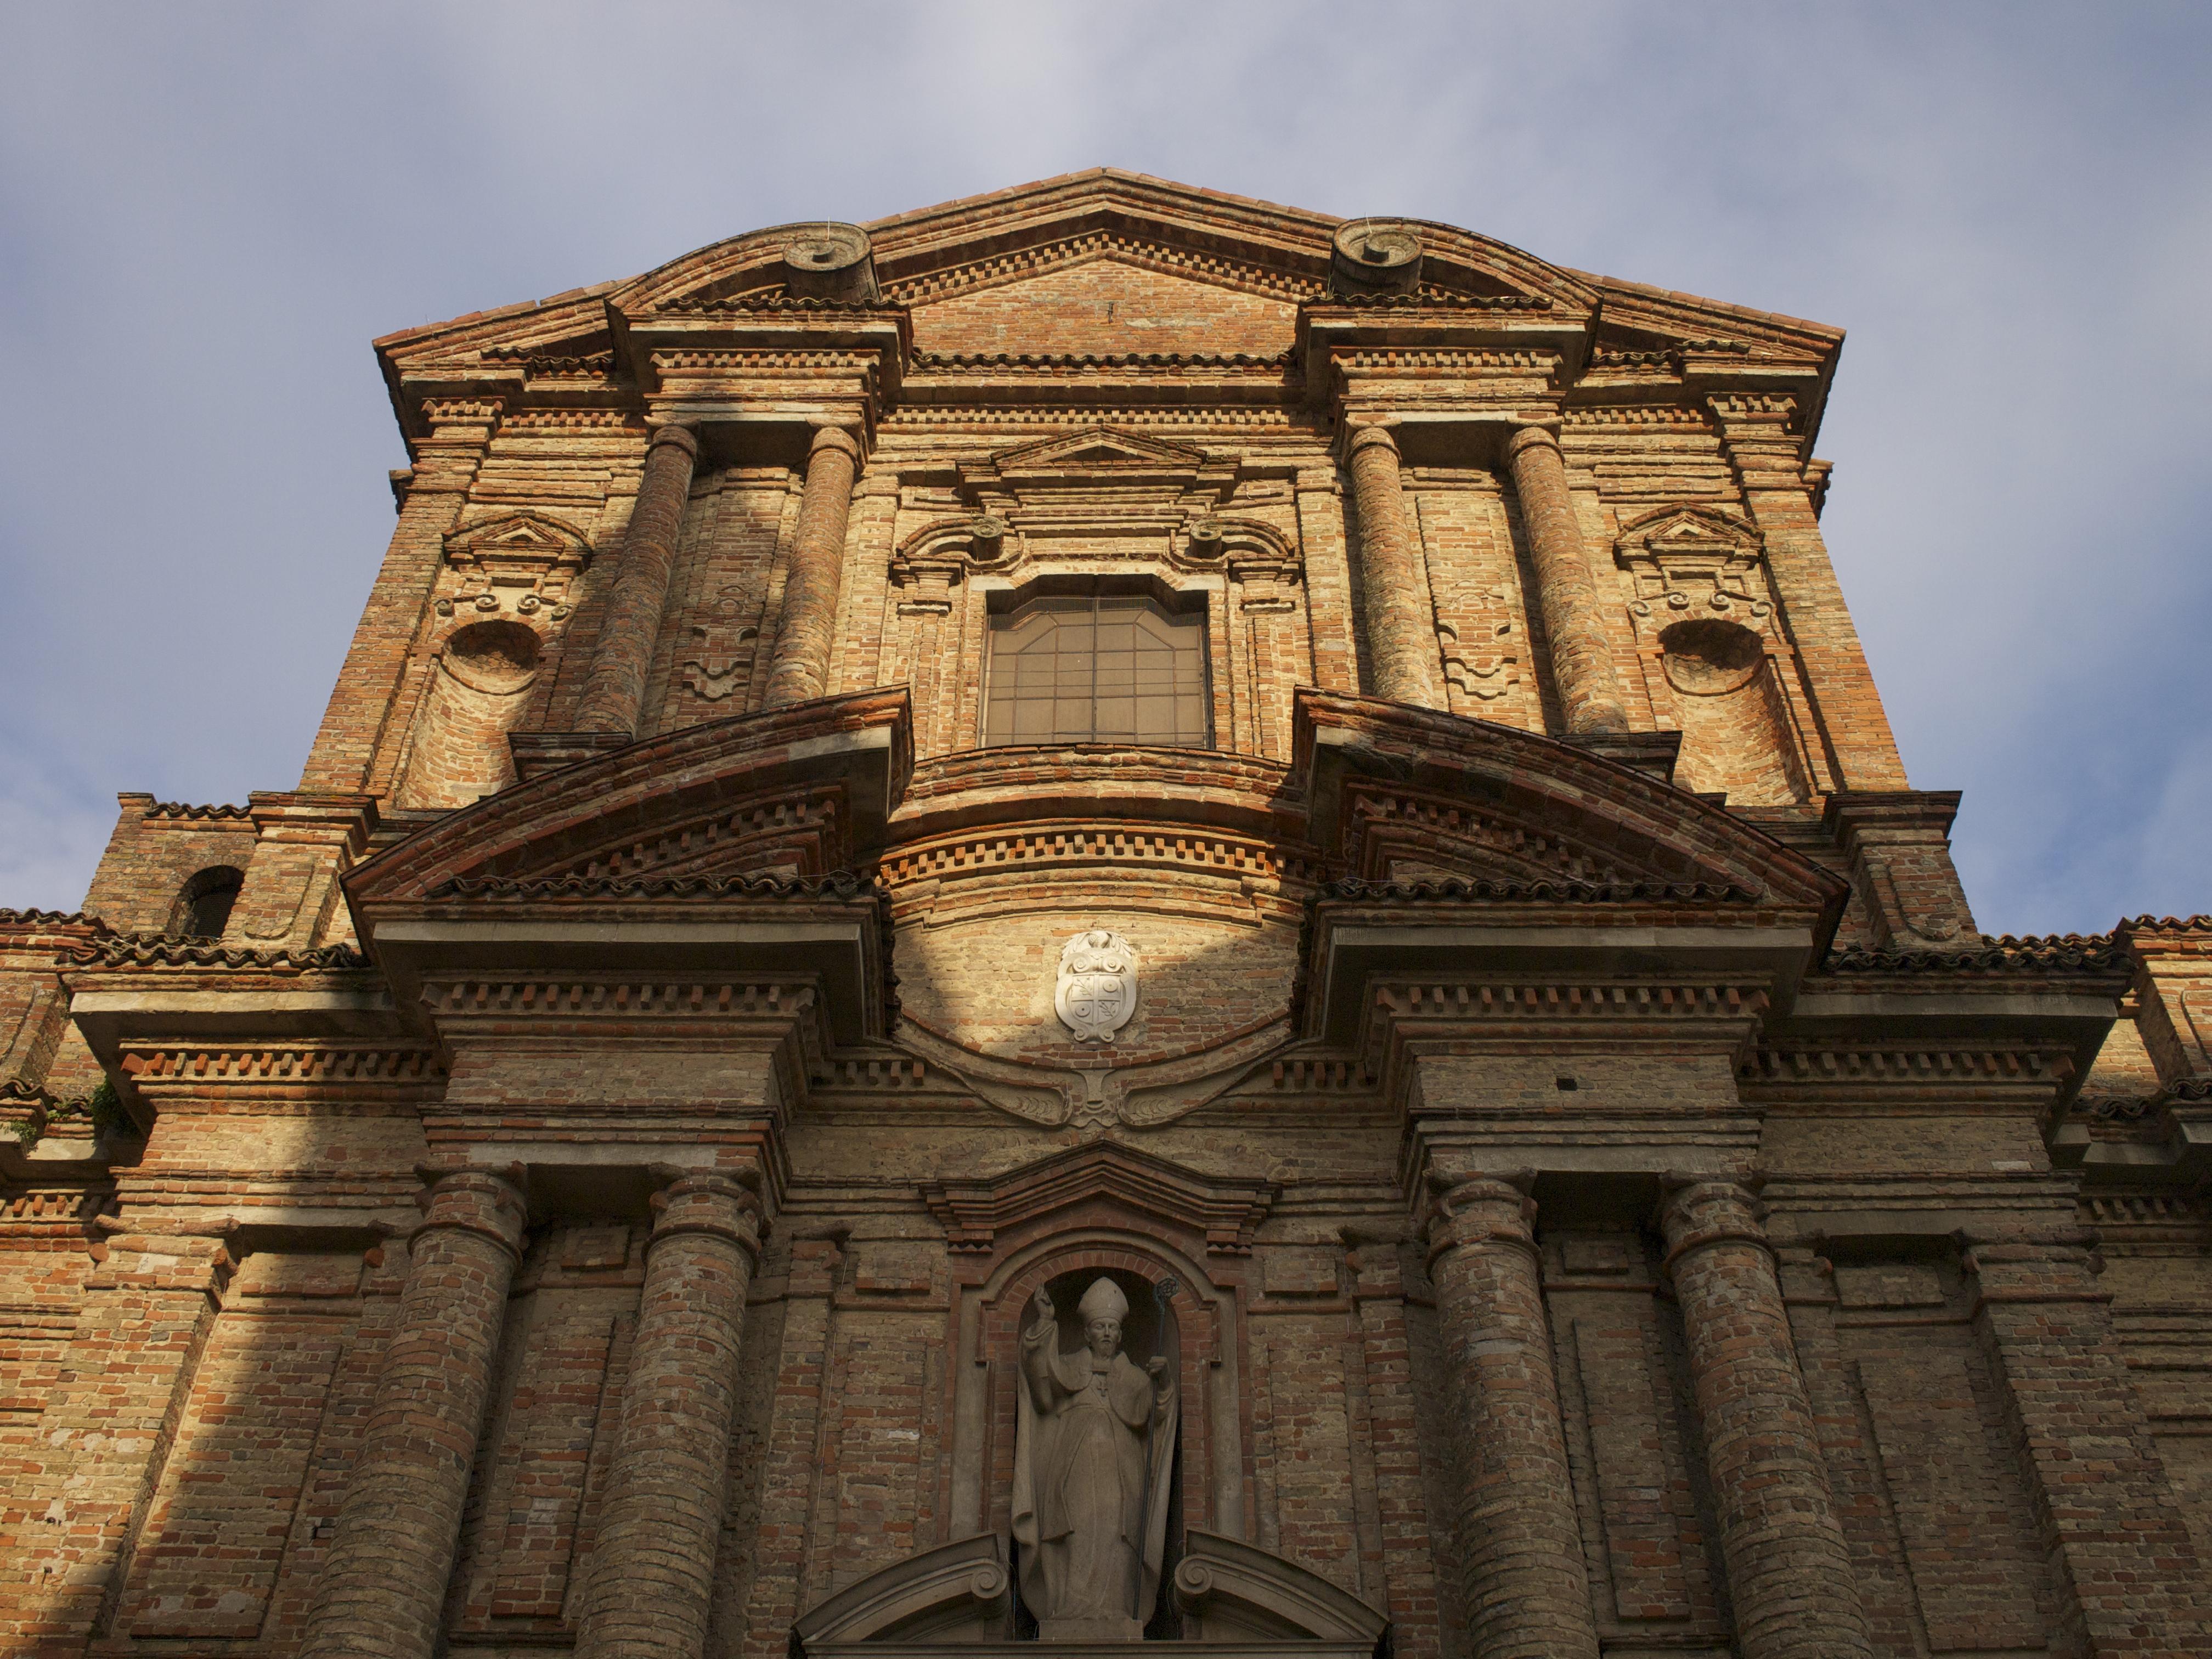 Saint Martin Parochial Church, La Morra, Italy, 2014